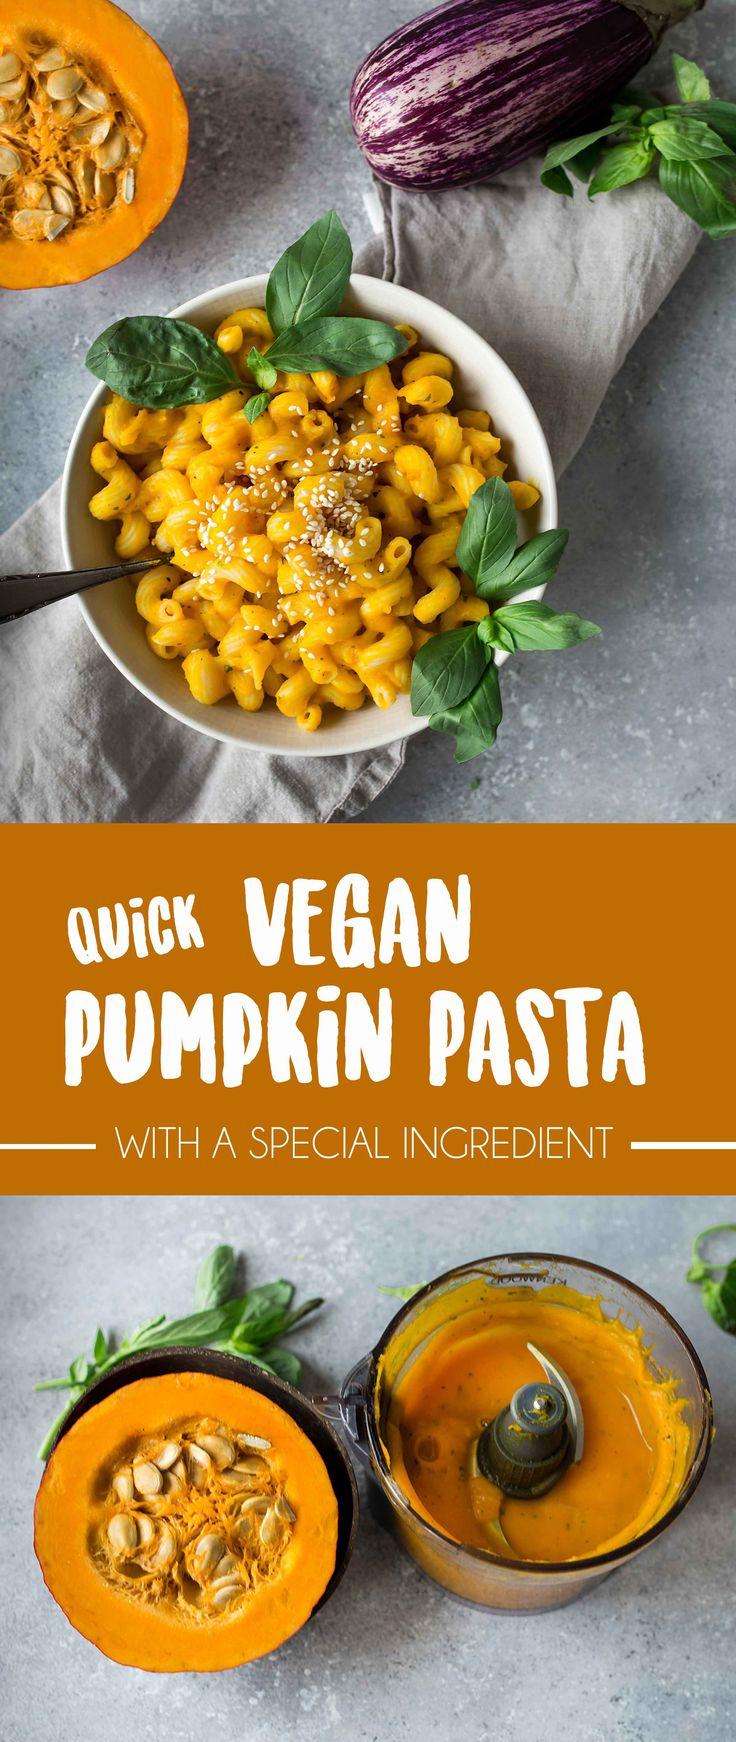 Quick and easy Vegan Pumpkin Pasta